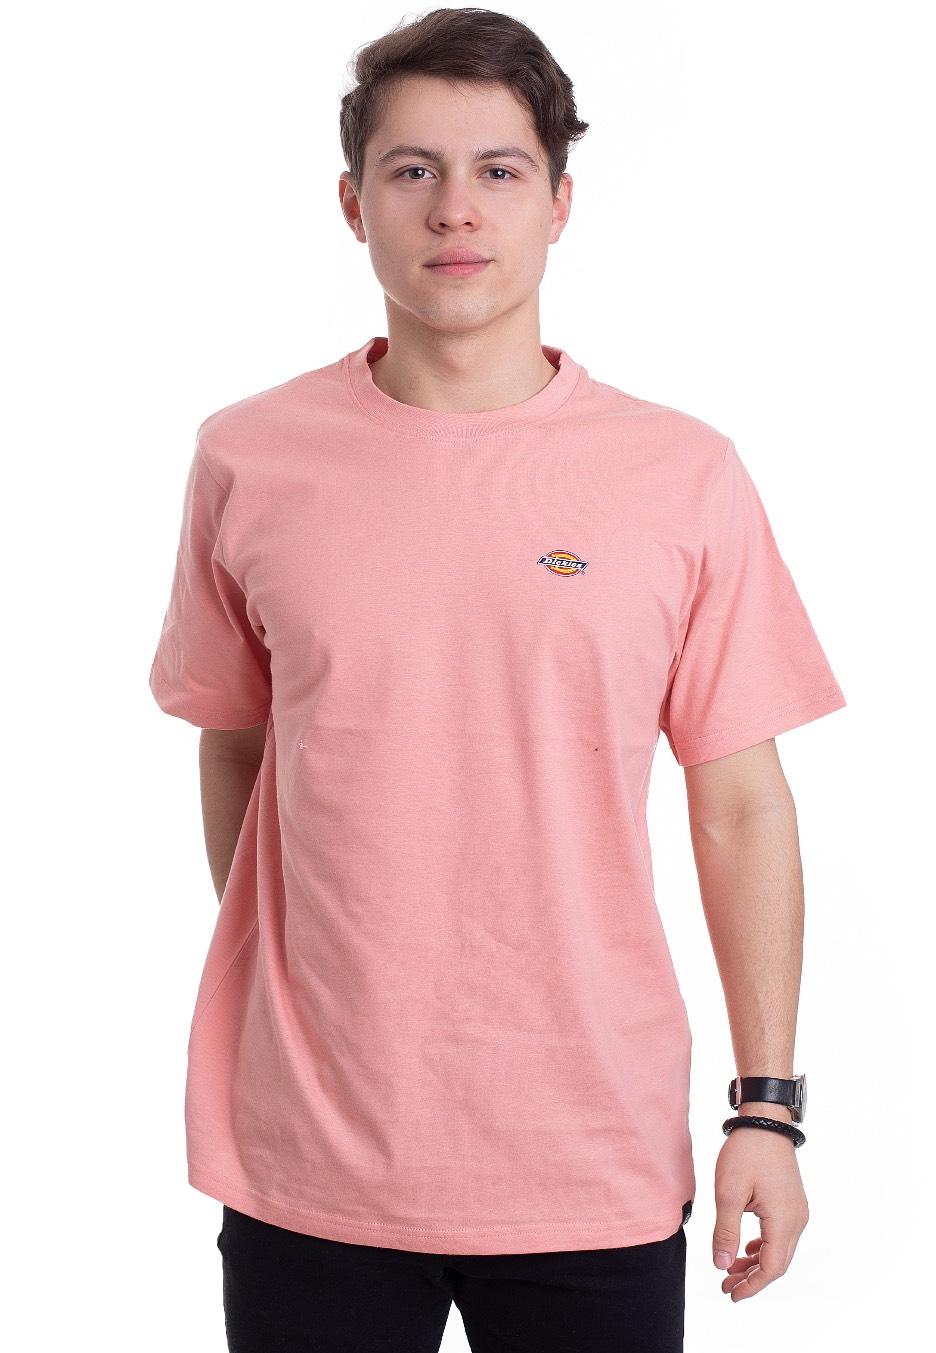 3cf29b882a Dickies - Stockdale Flamingo - T-Shirt - Impericon.com UK